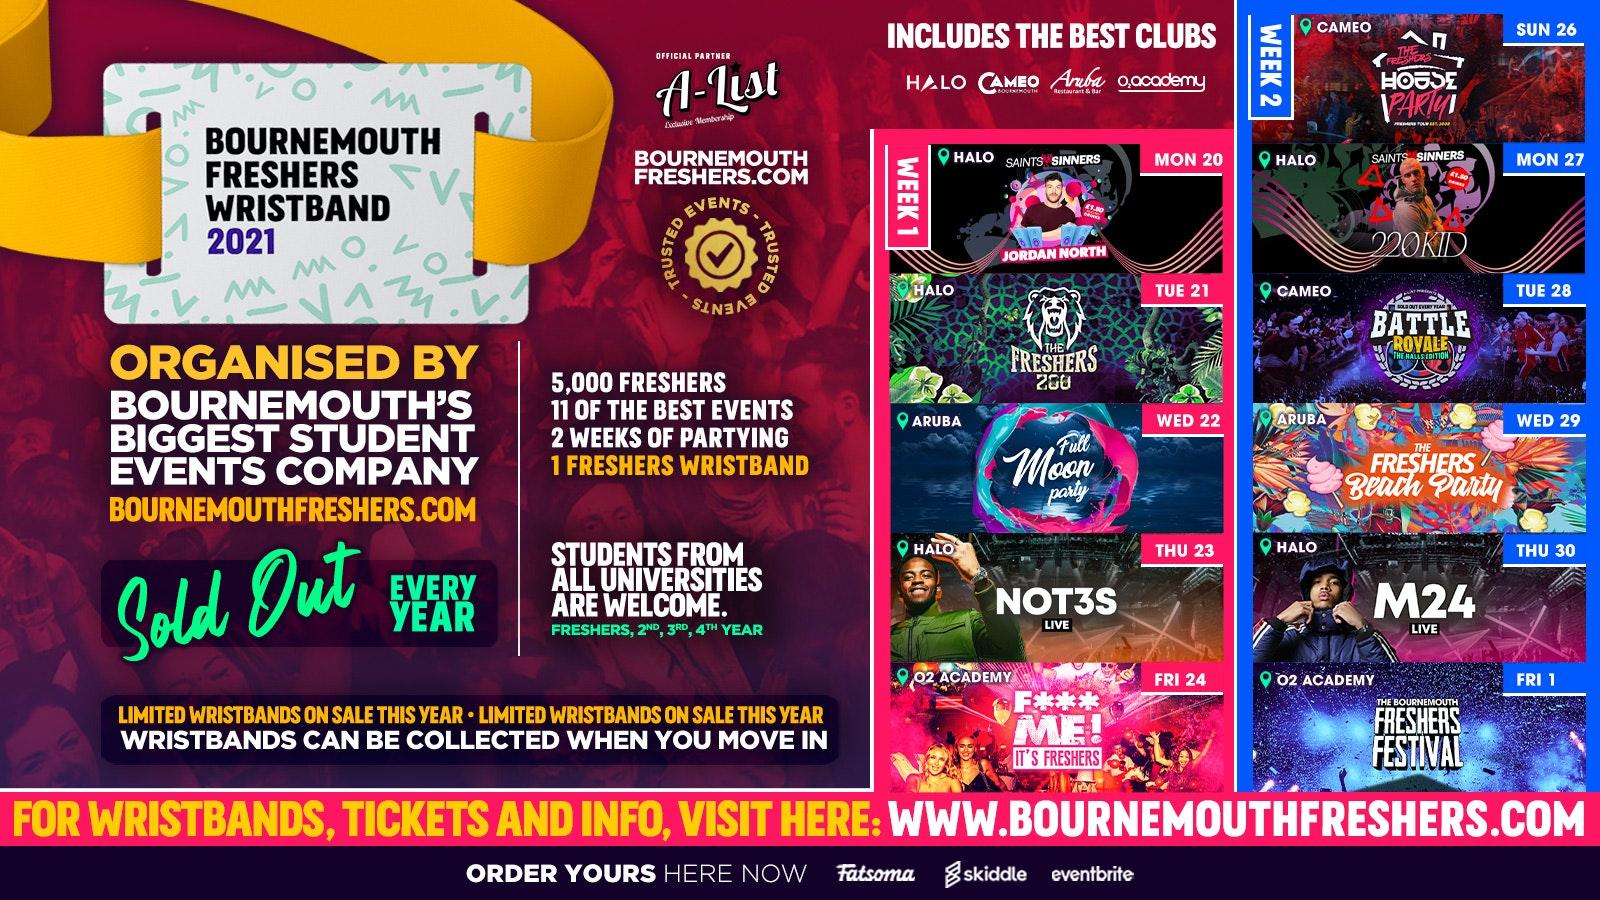 Bournemouth Freshers 2021 – www.bournemouthfreshers.com   Sign Up 2021